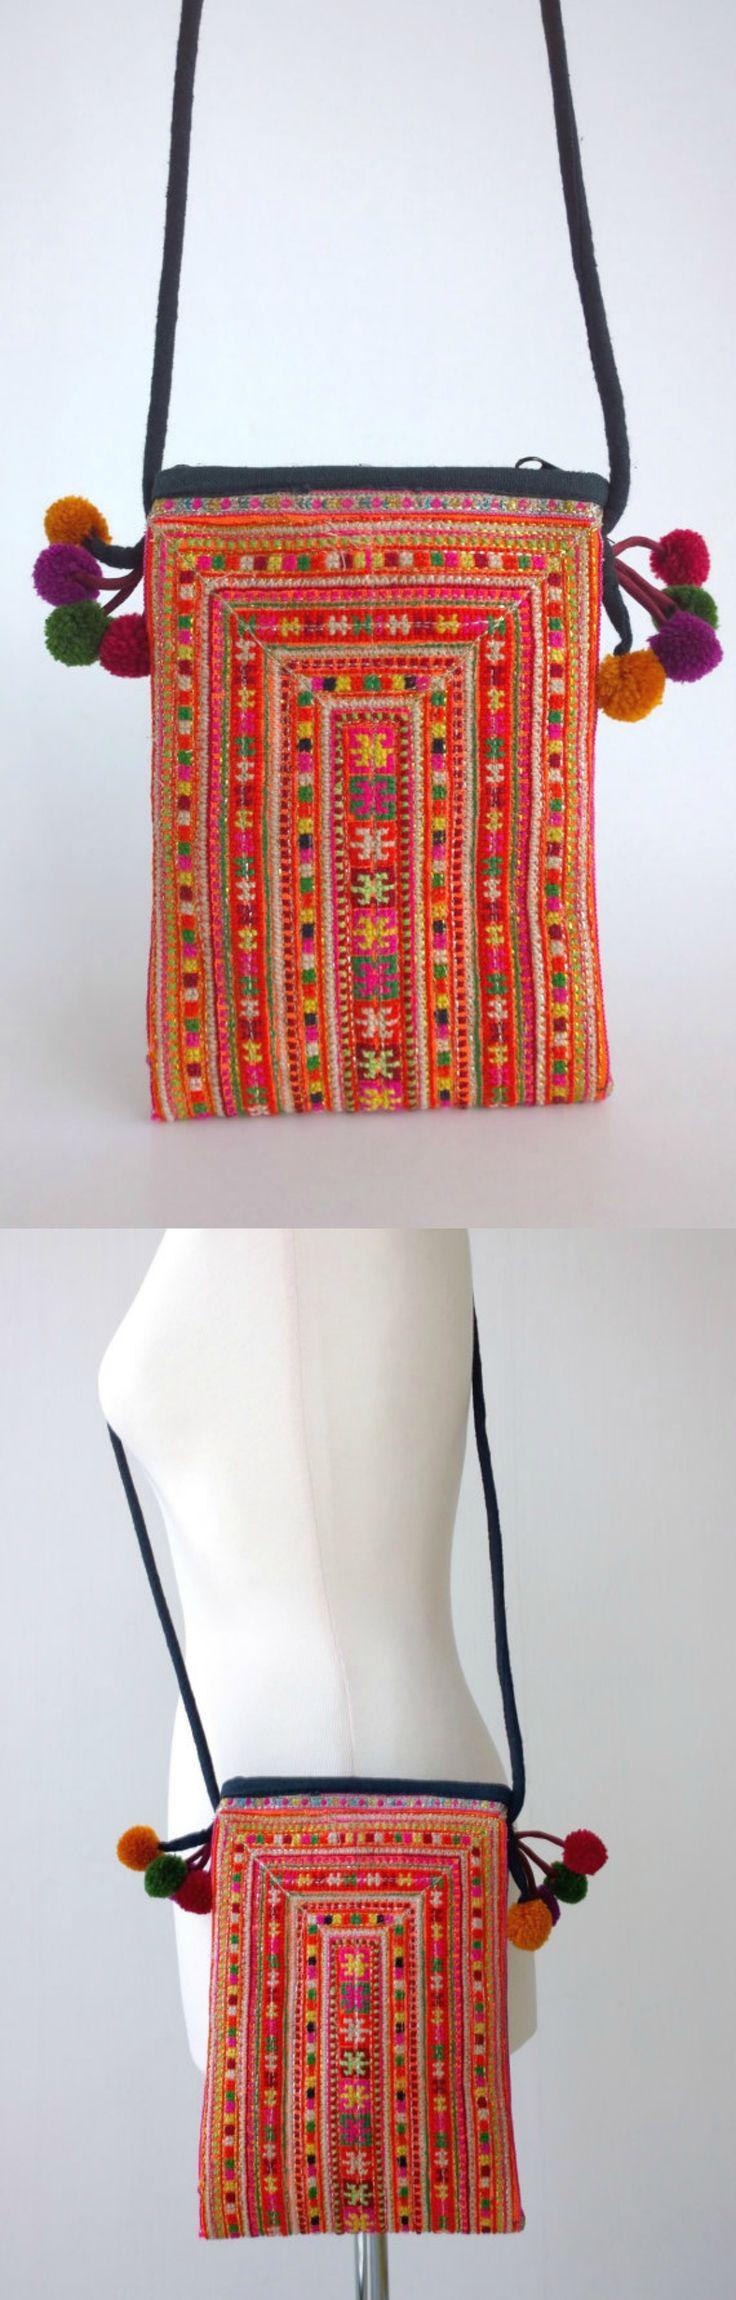 Hmong Crossbody Bag - Boho Crossbody Bag - Ethnic Tribal Bag ( FREE SHIPPING WORLDWIDE )